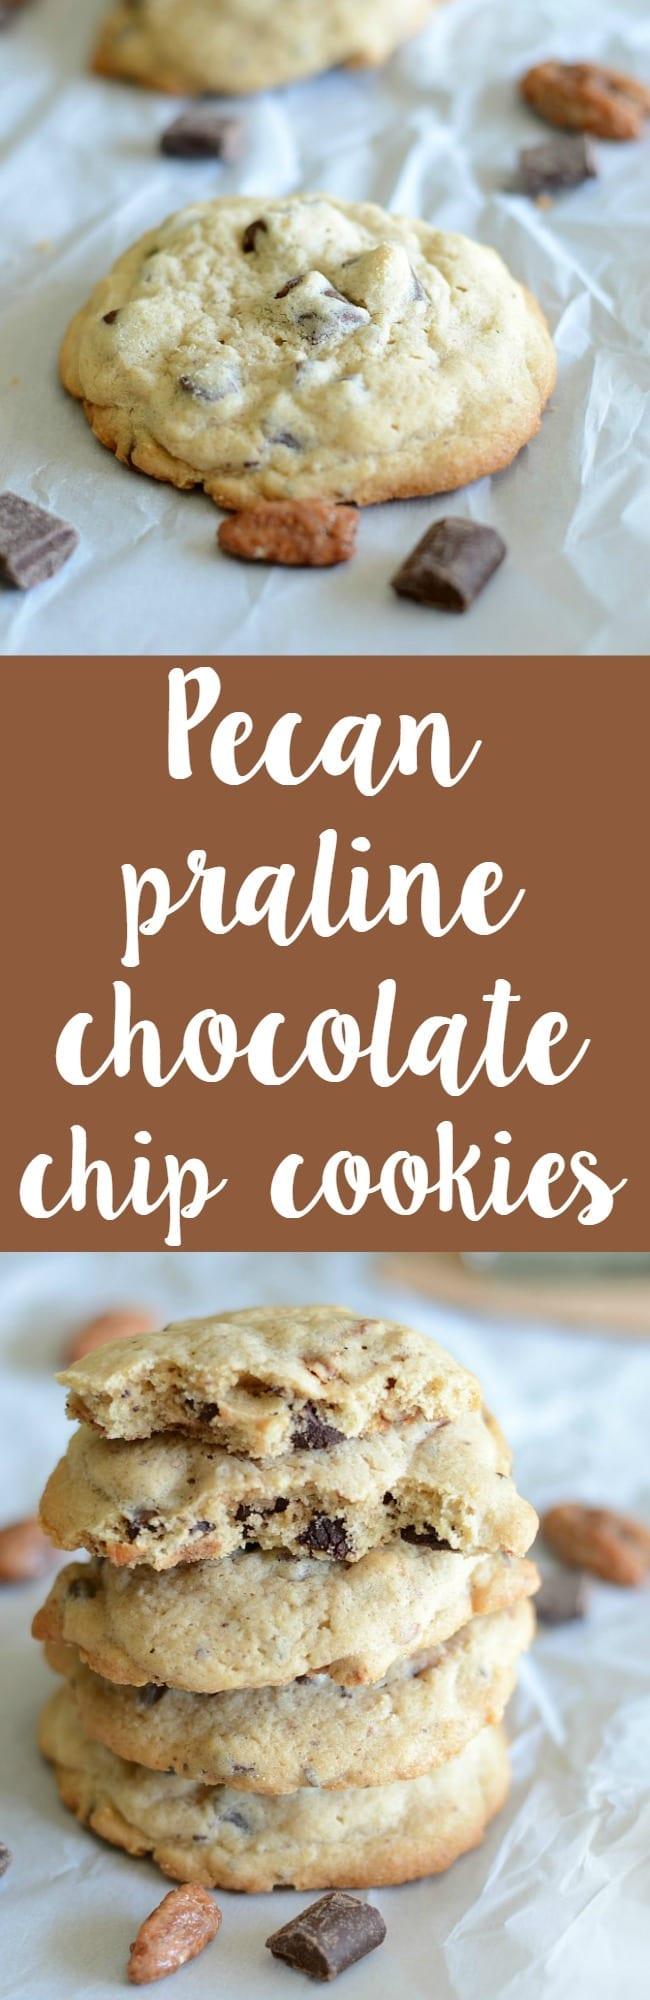 Homemade pecan praline chocolate chip cookies